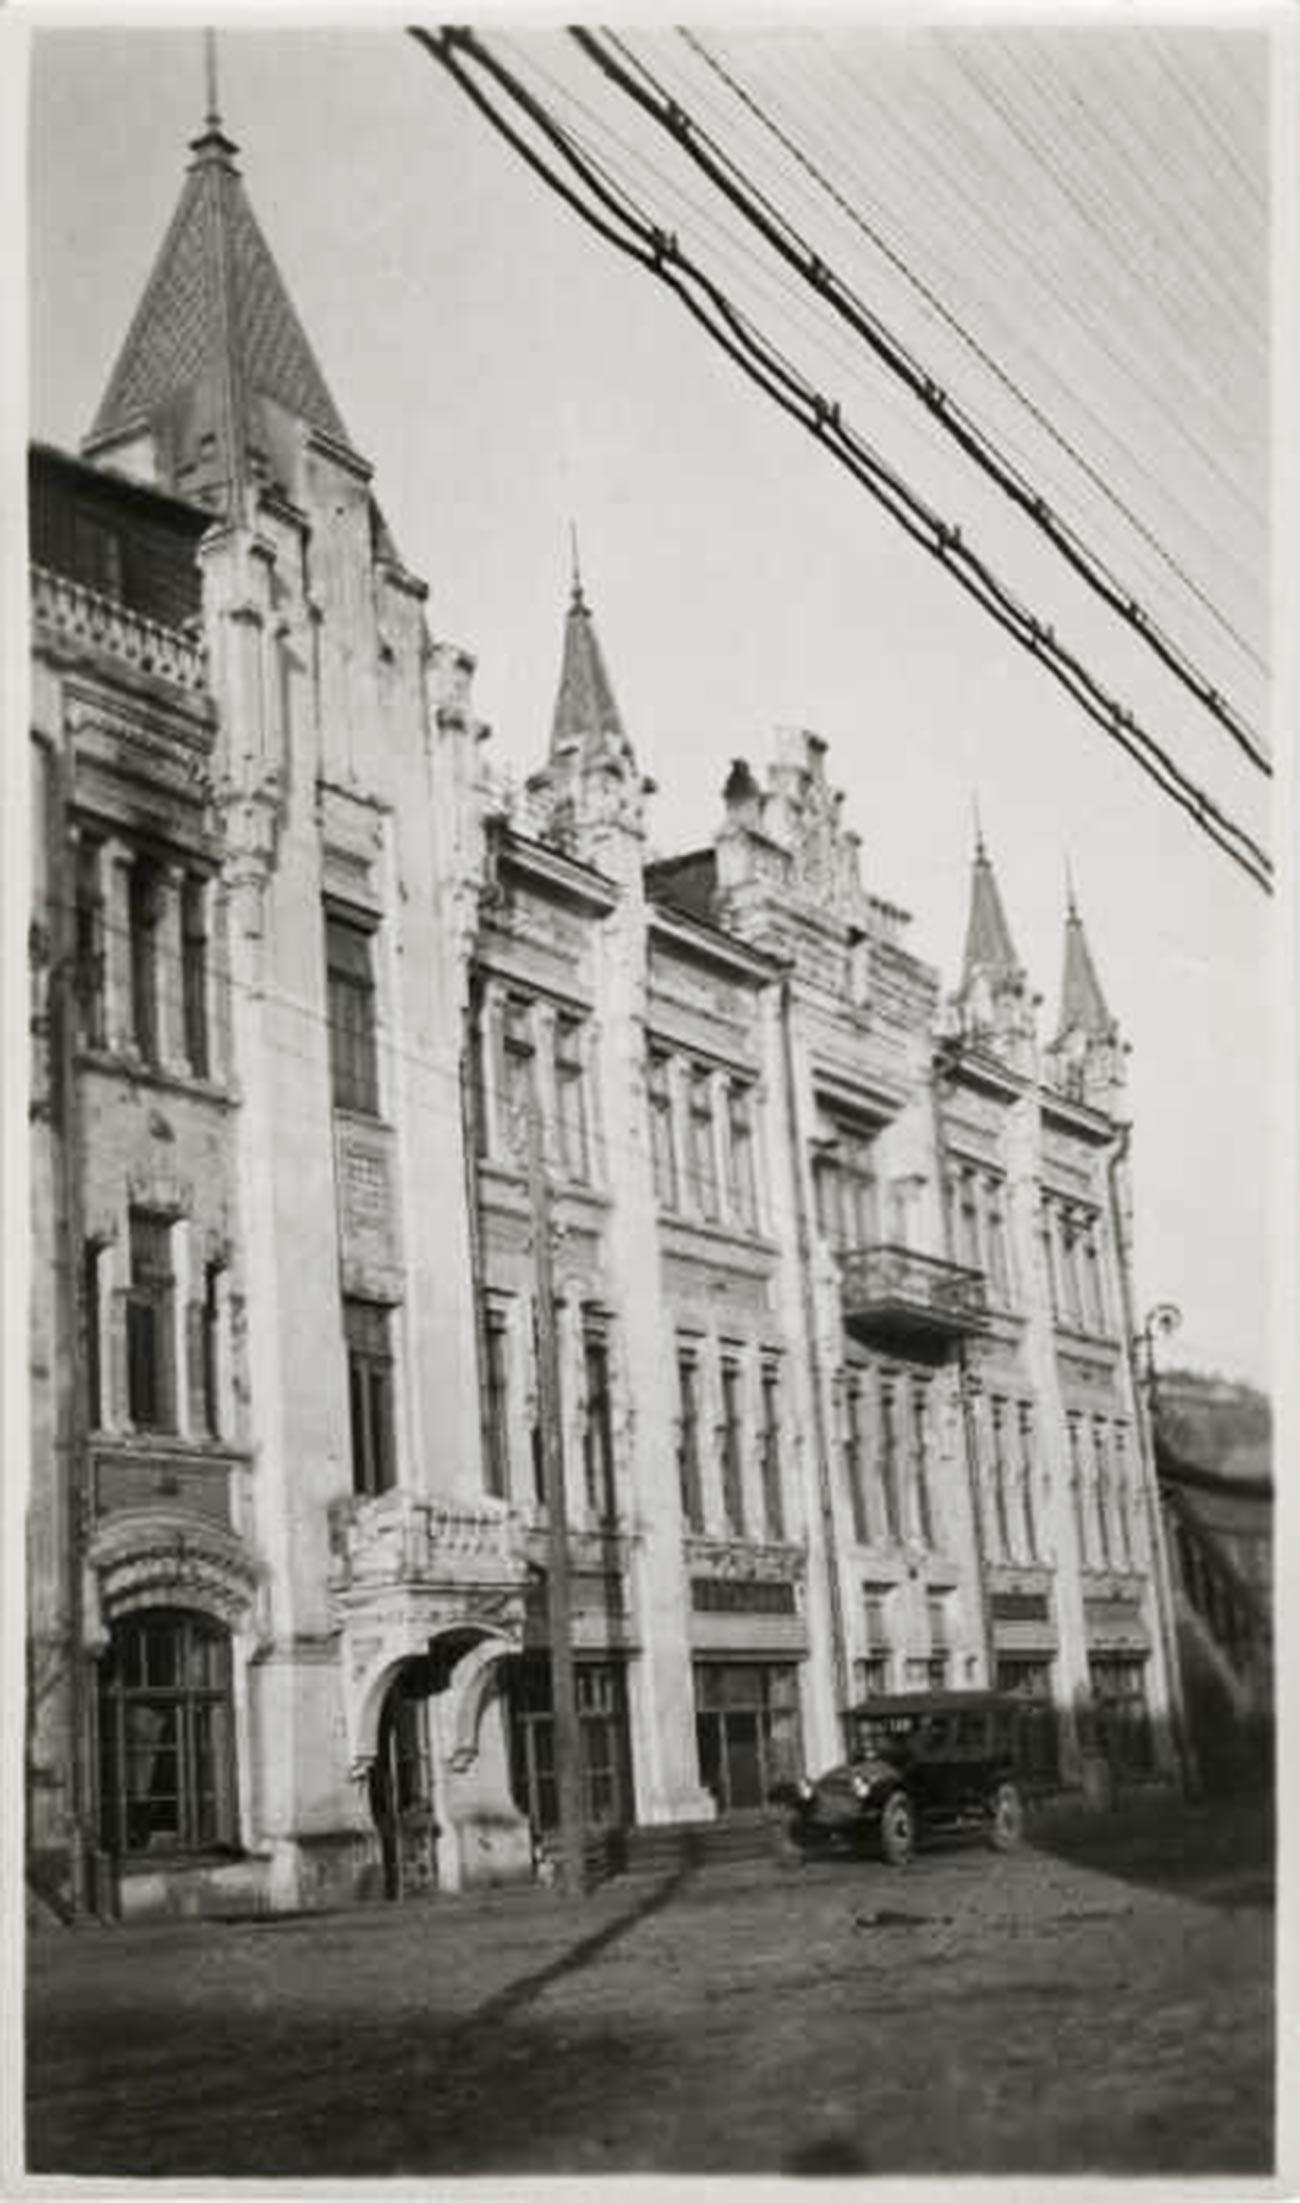 The Pushkin Theater, Vladivostok, Russia